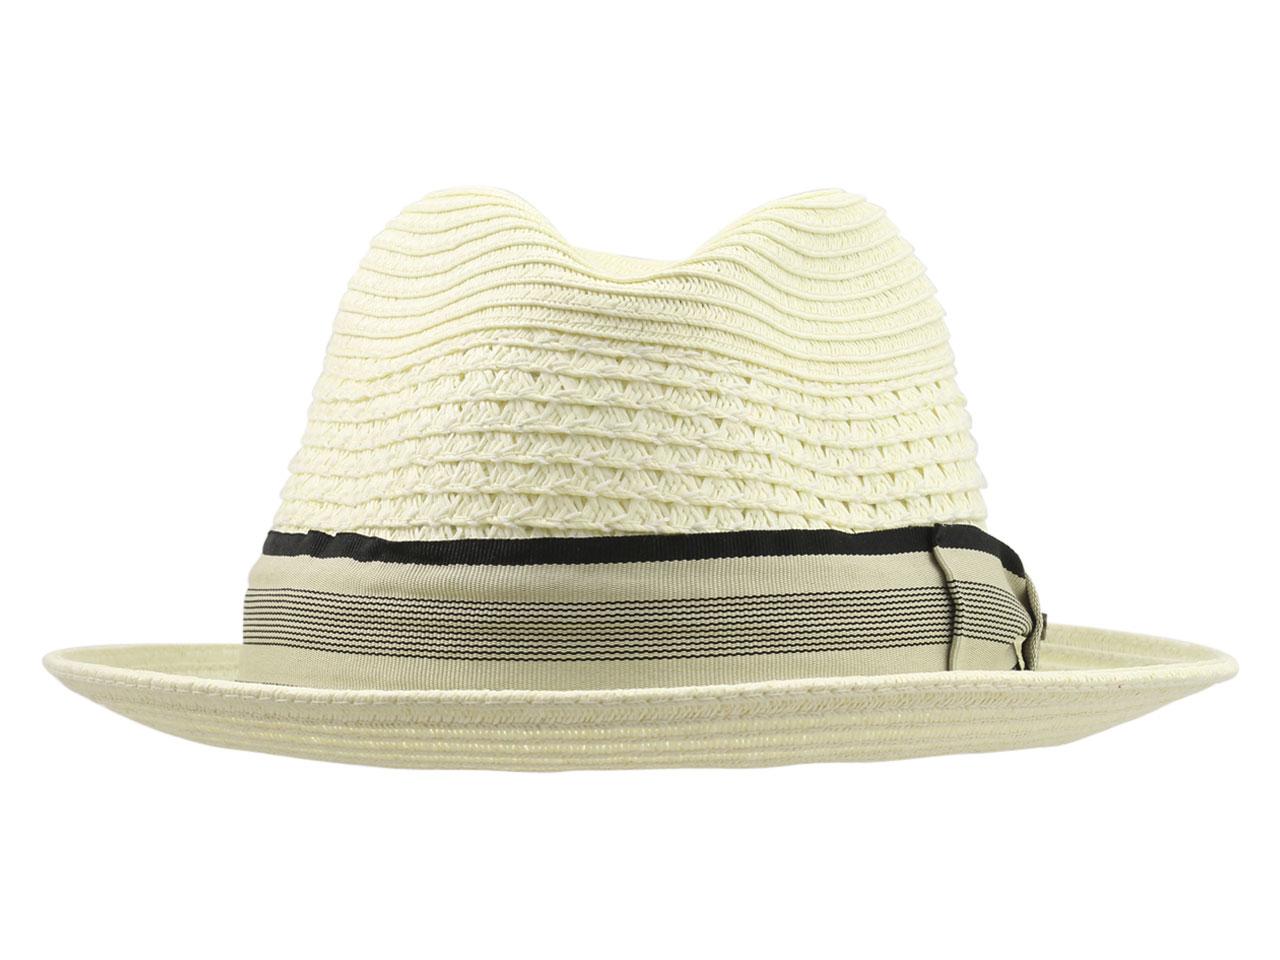 0a93689b Scala Men's Paper Braid Toyo Fedora Hat | eBay